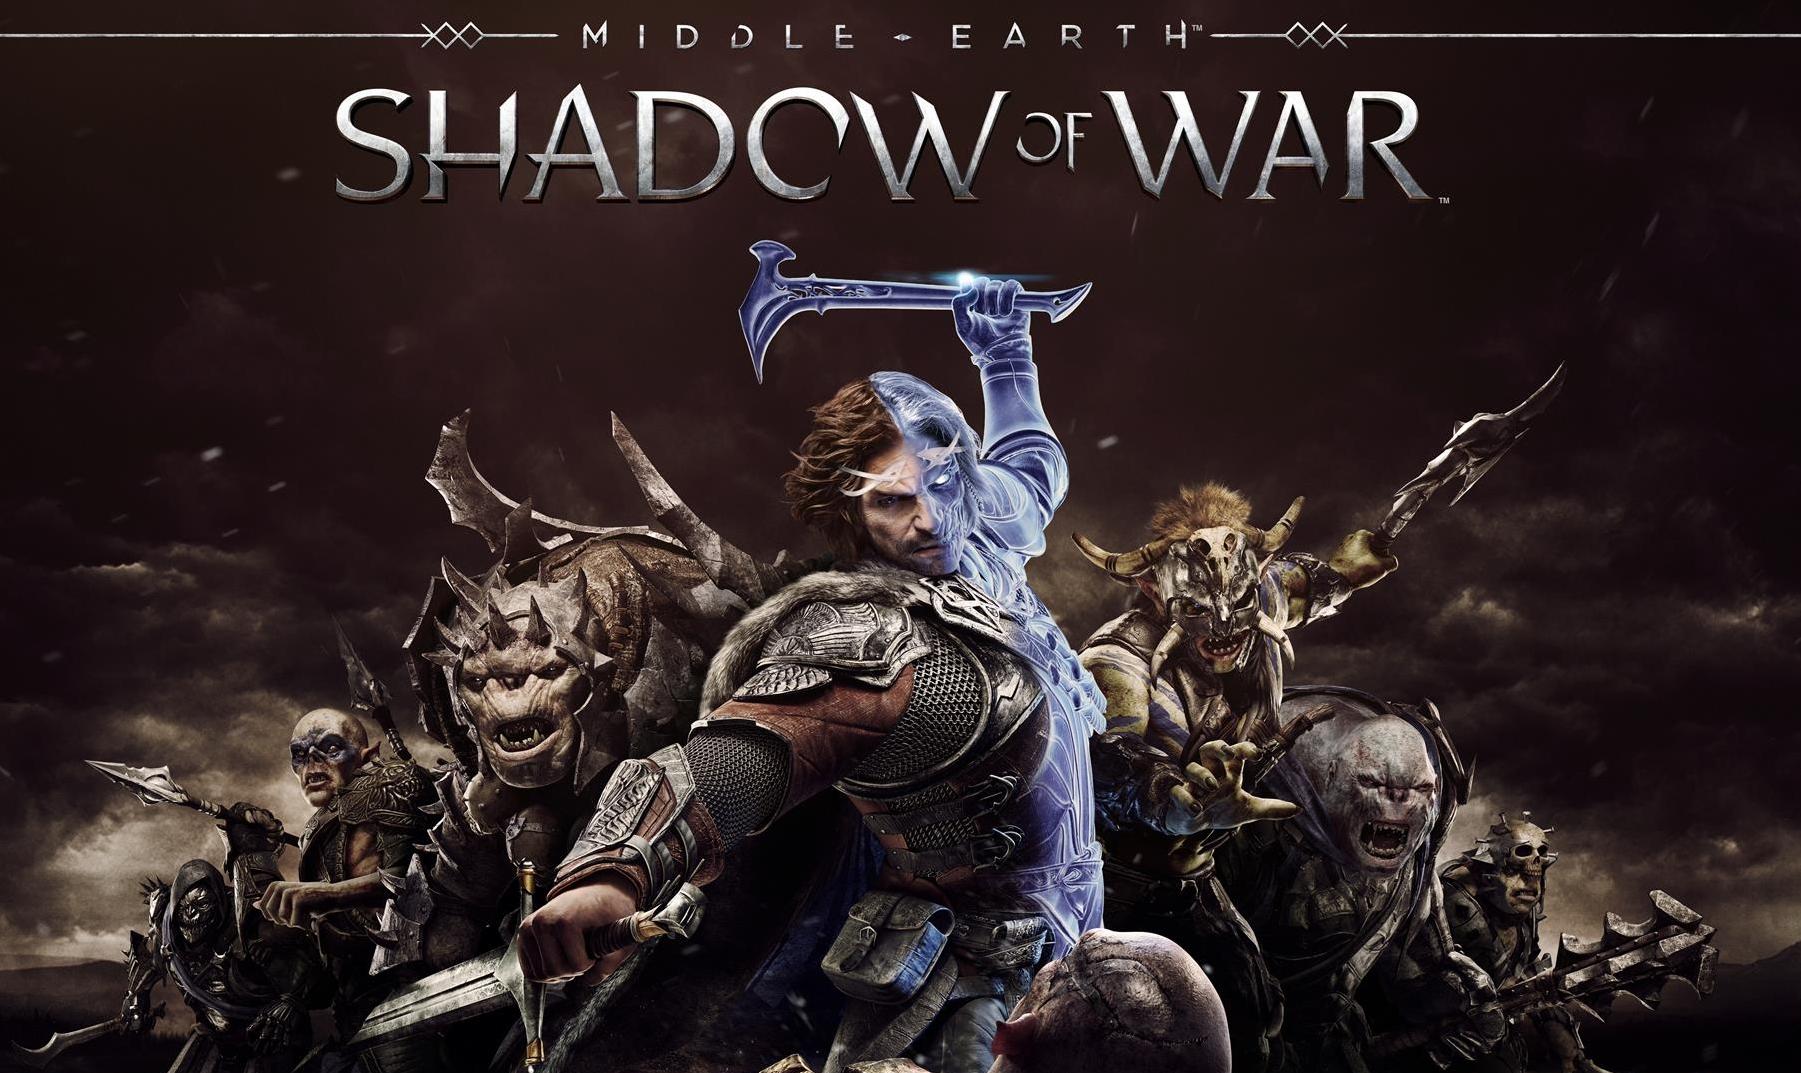 「Middle earth: Shadow of War」的圖片搜尋結果